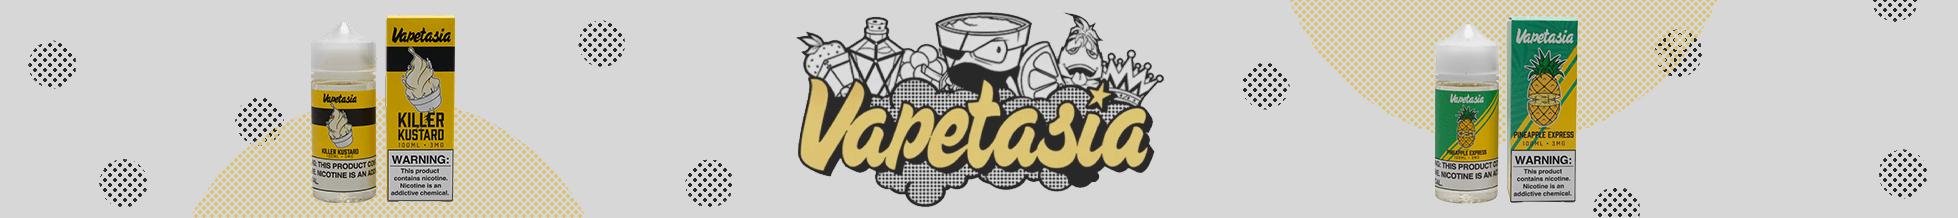 vapetasia-juice-category-banner.png